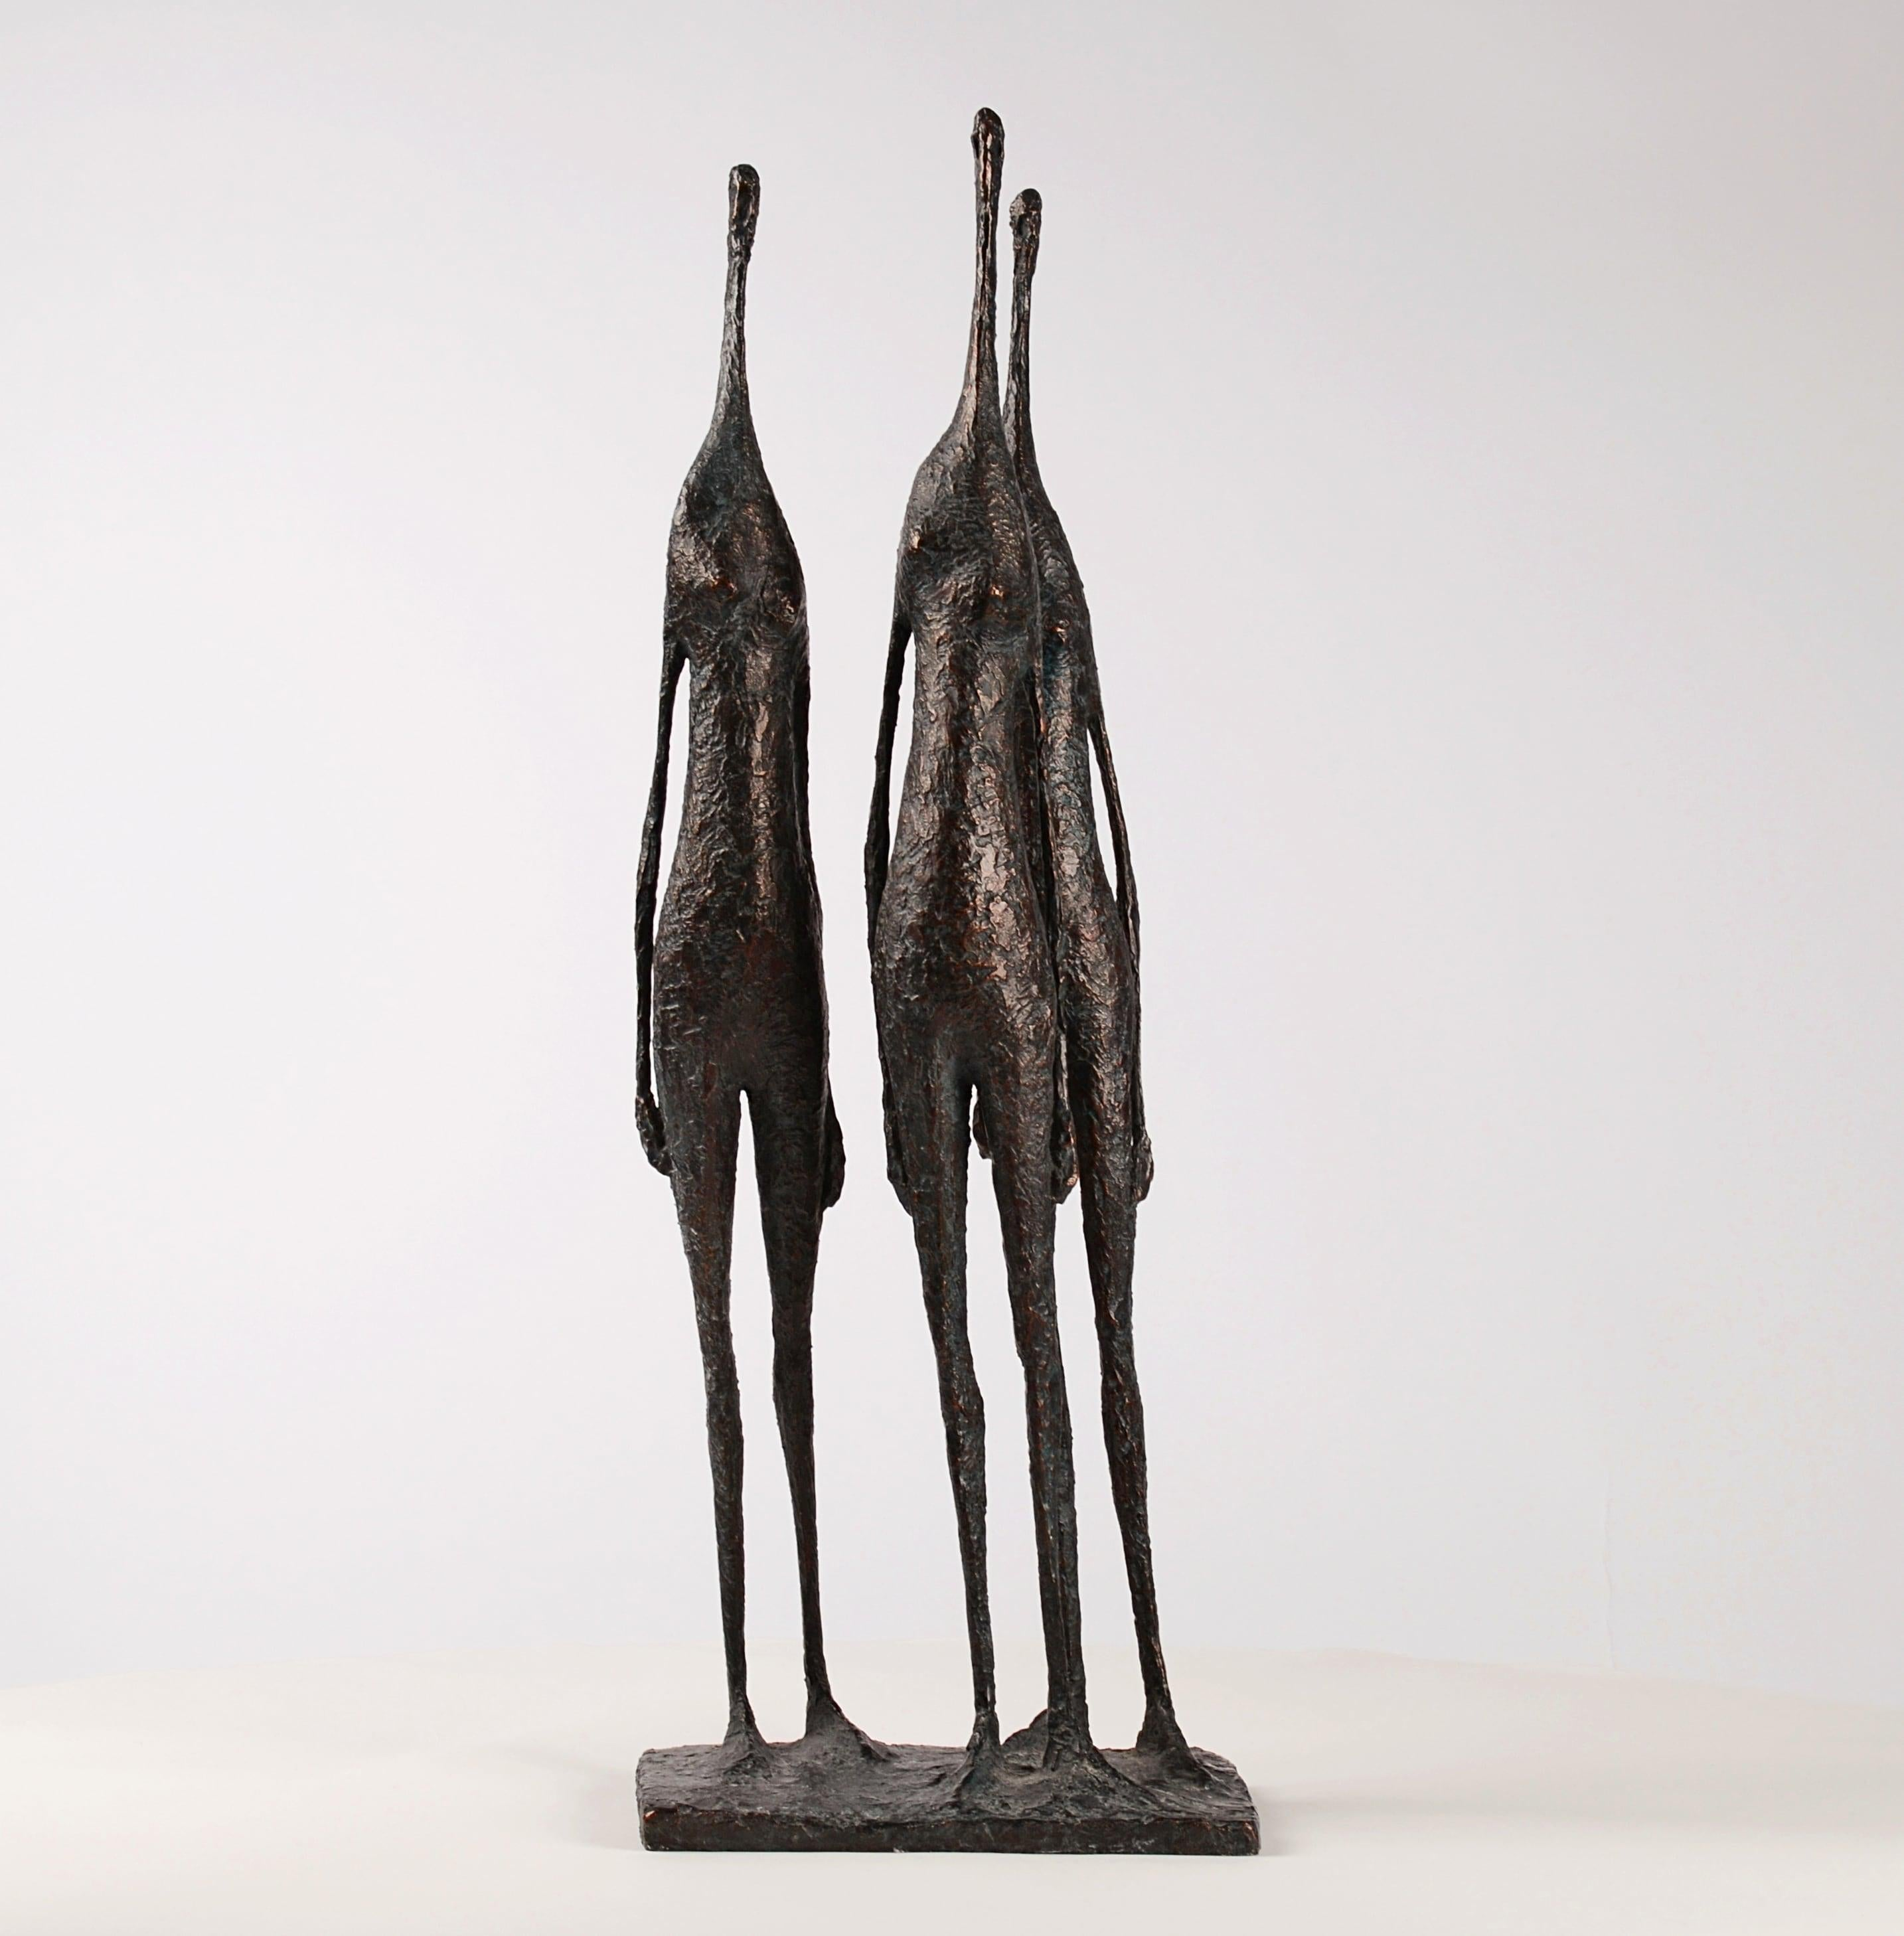 3 Standing Figures IV - Bronze Group of Three Figures